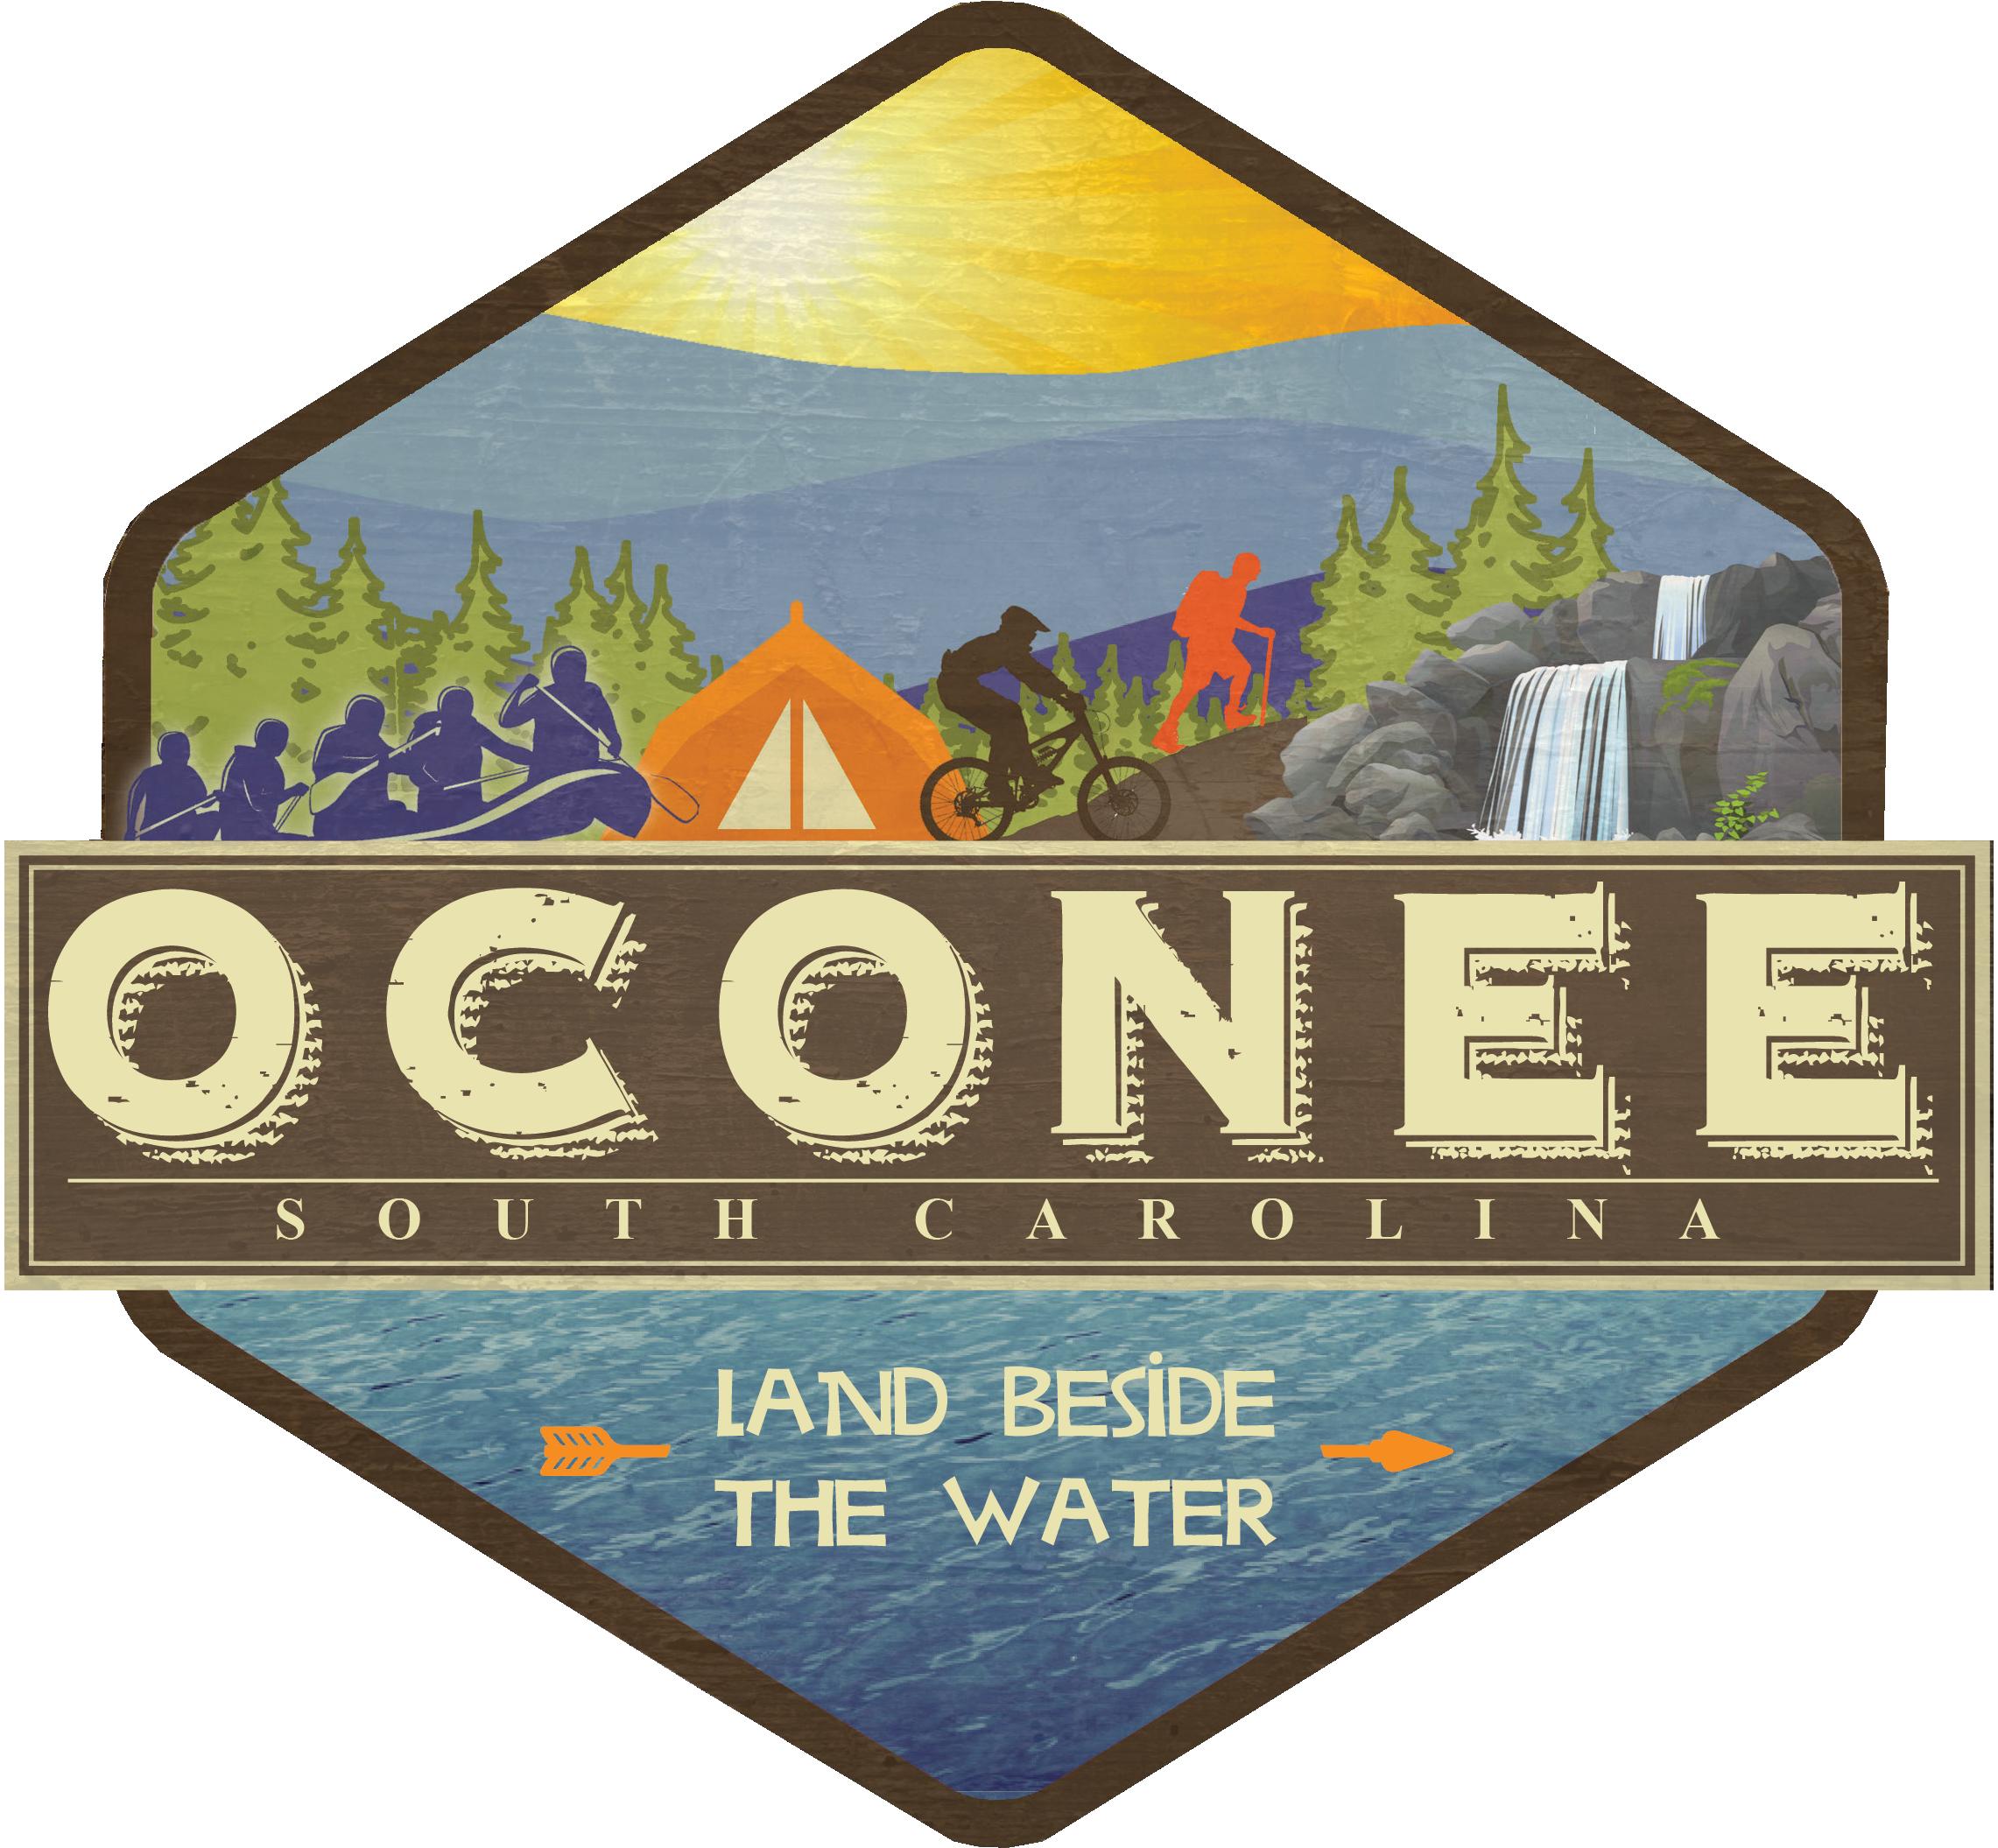 Oconee County, SC